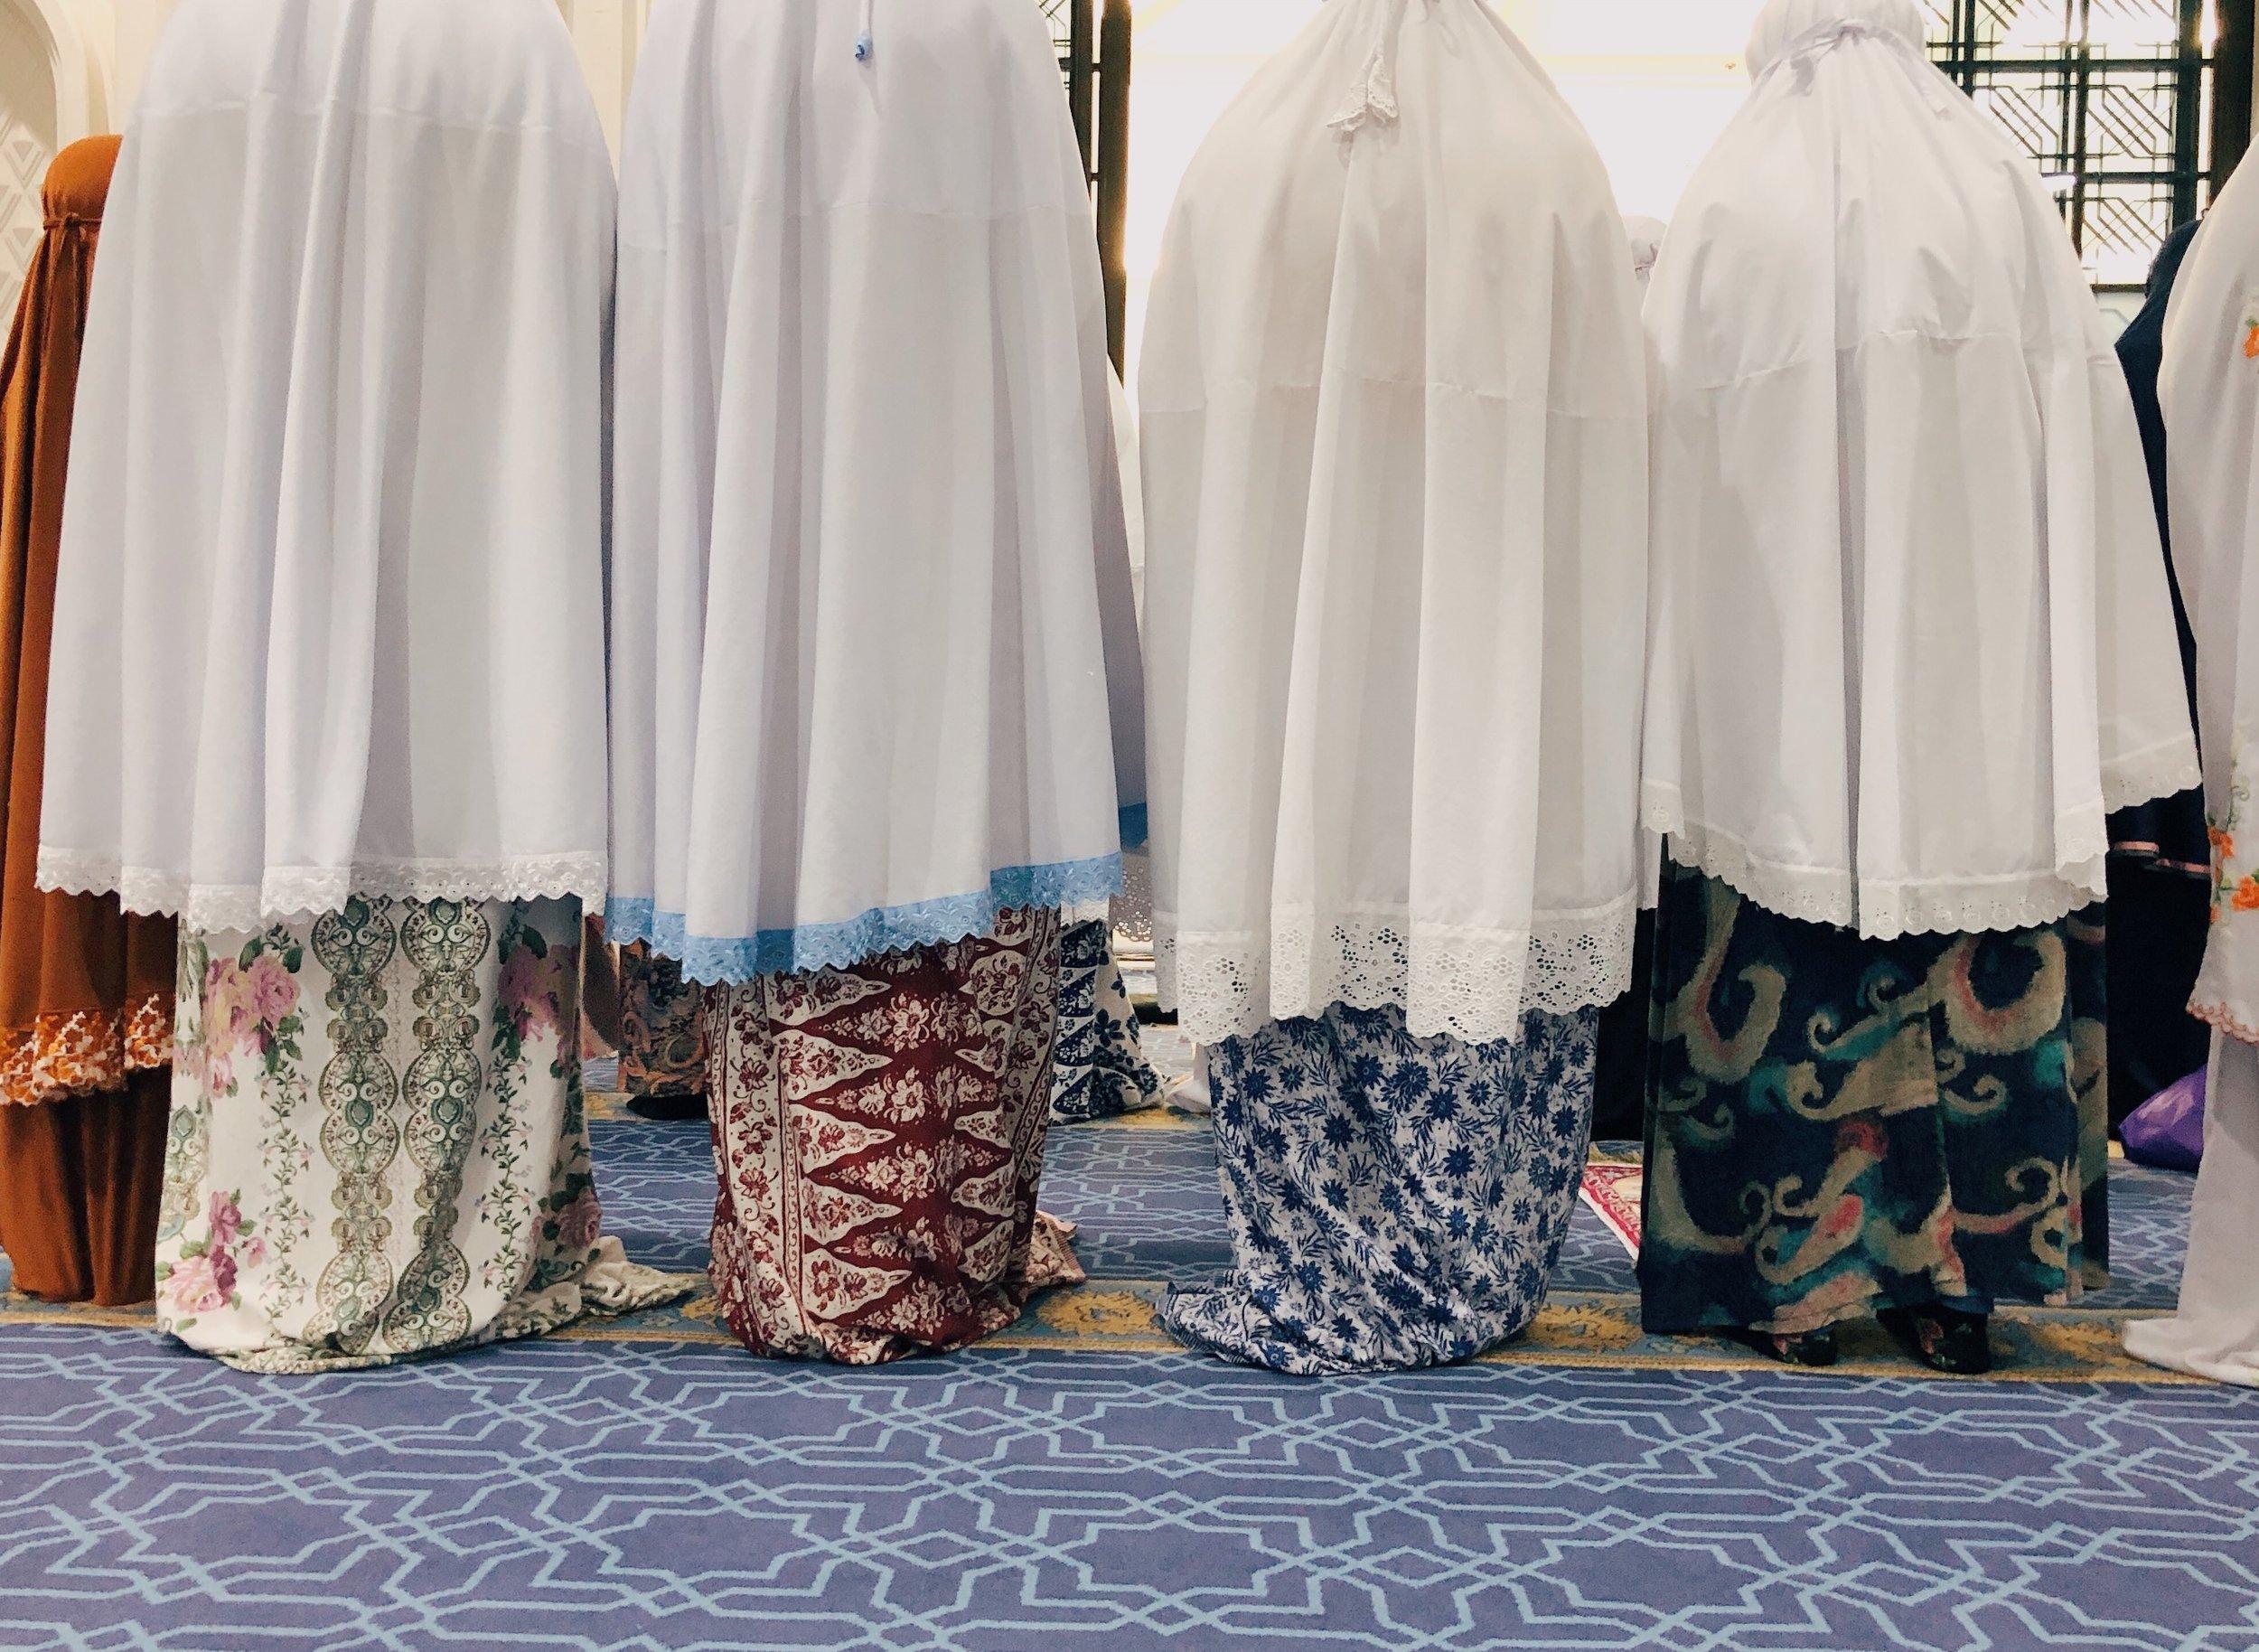 Last tarawih of 2019 / 1440 AH